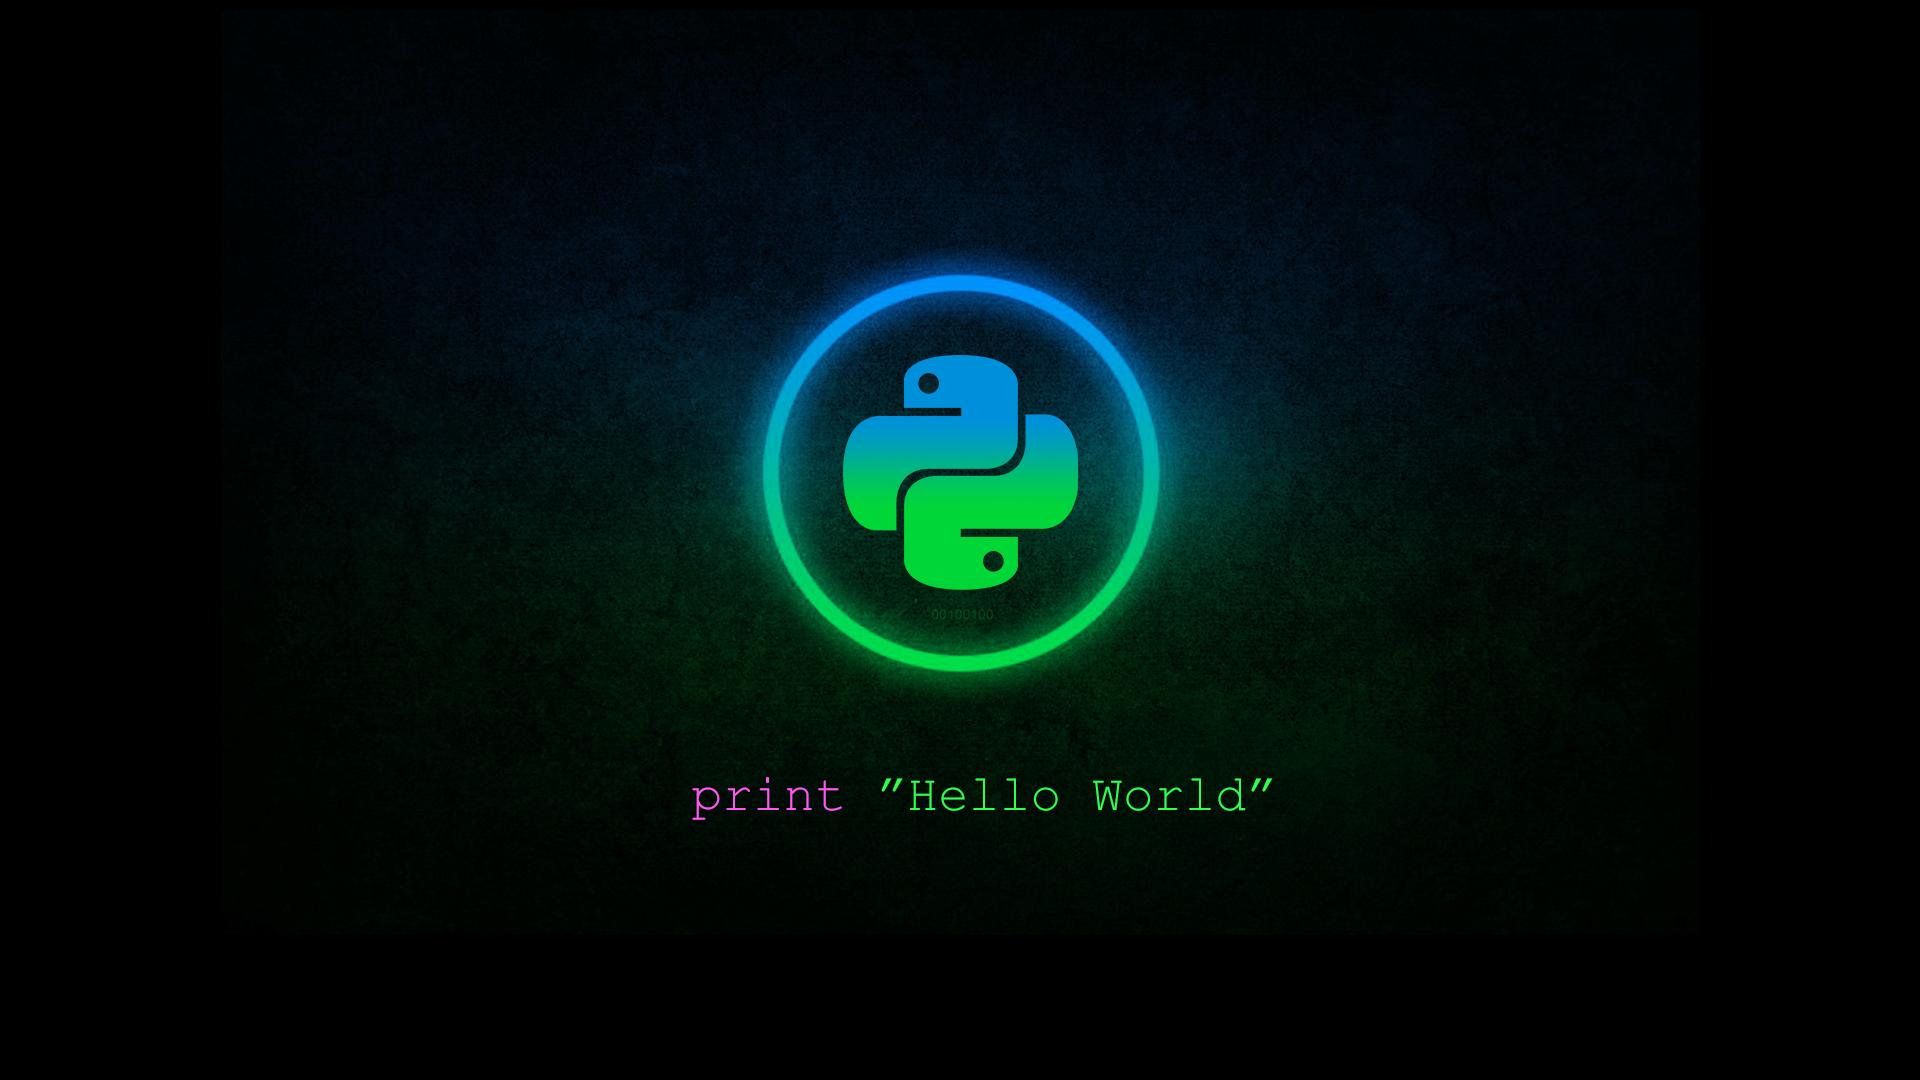 Python Programming Language Wallpaper Hd Wallpaper